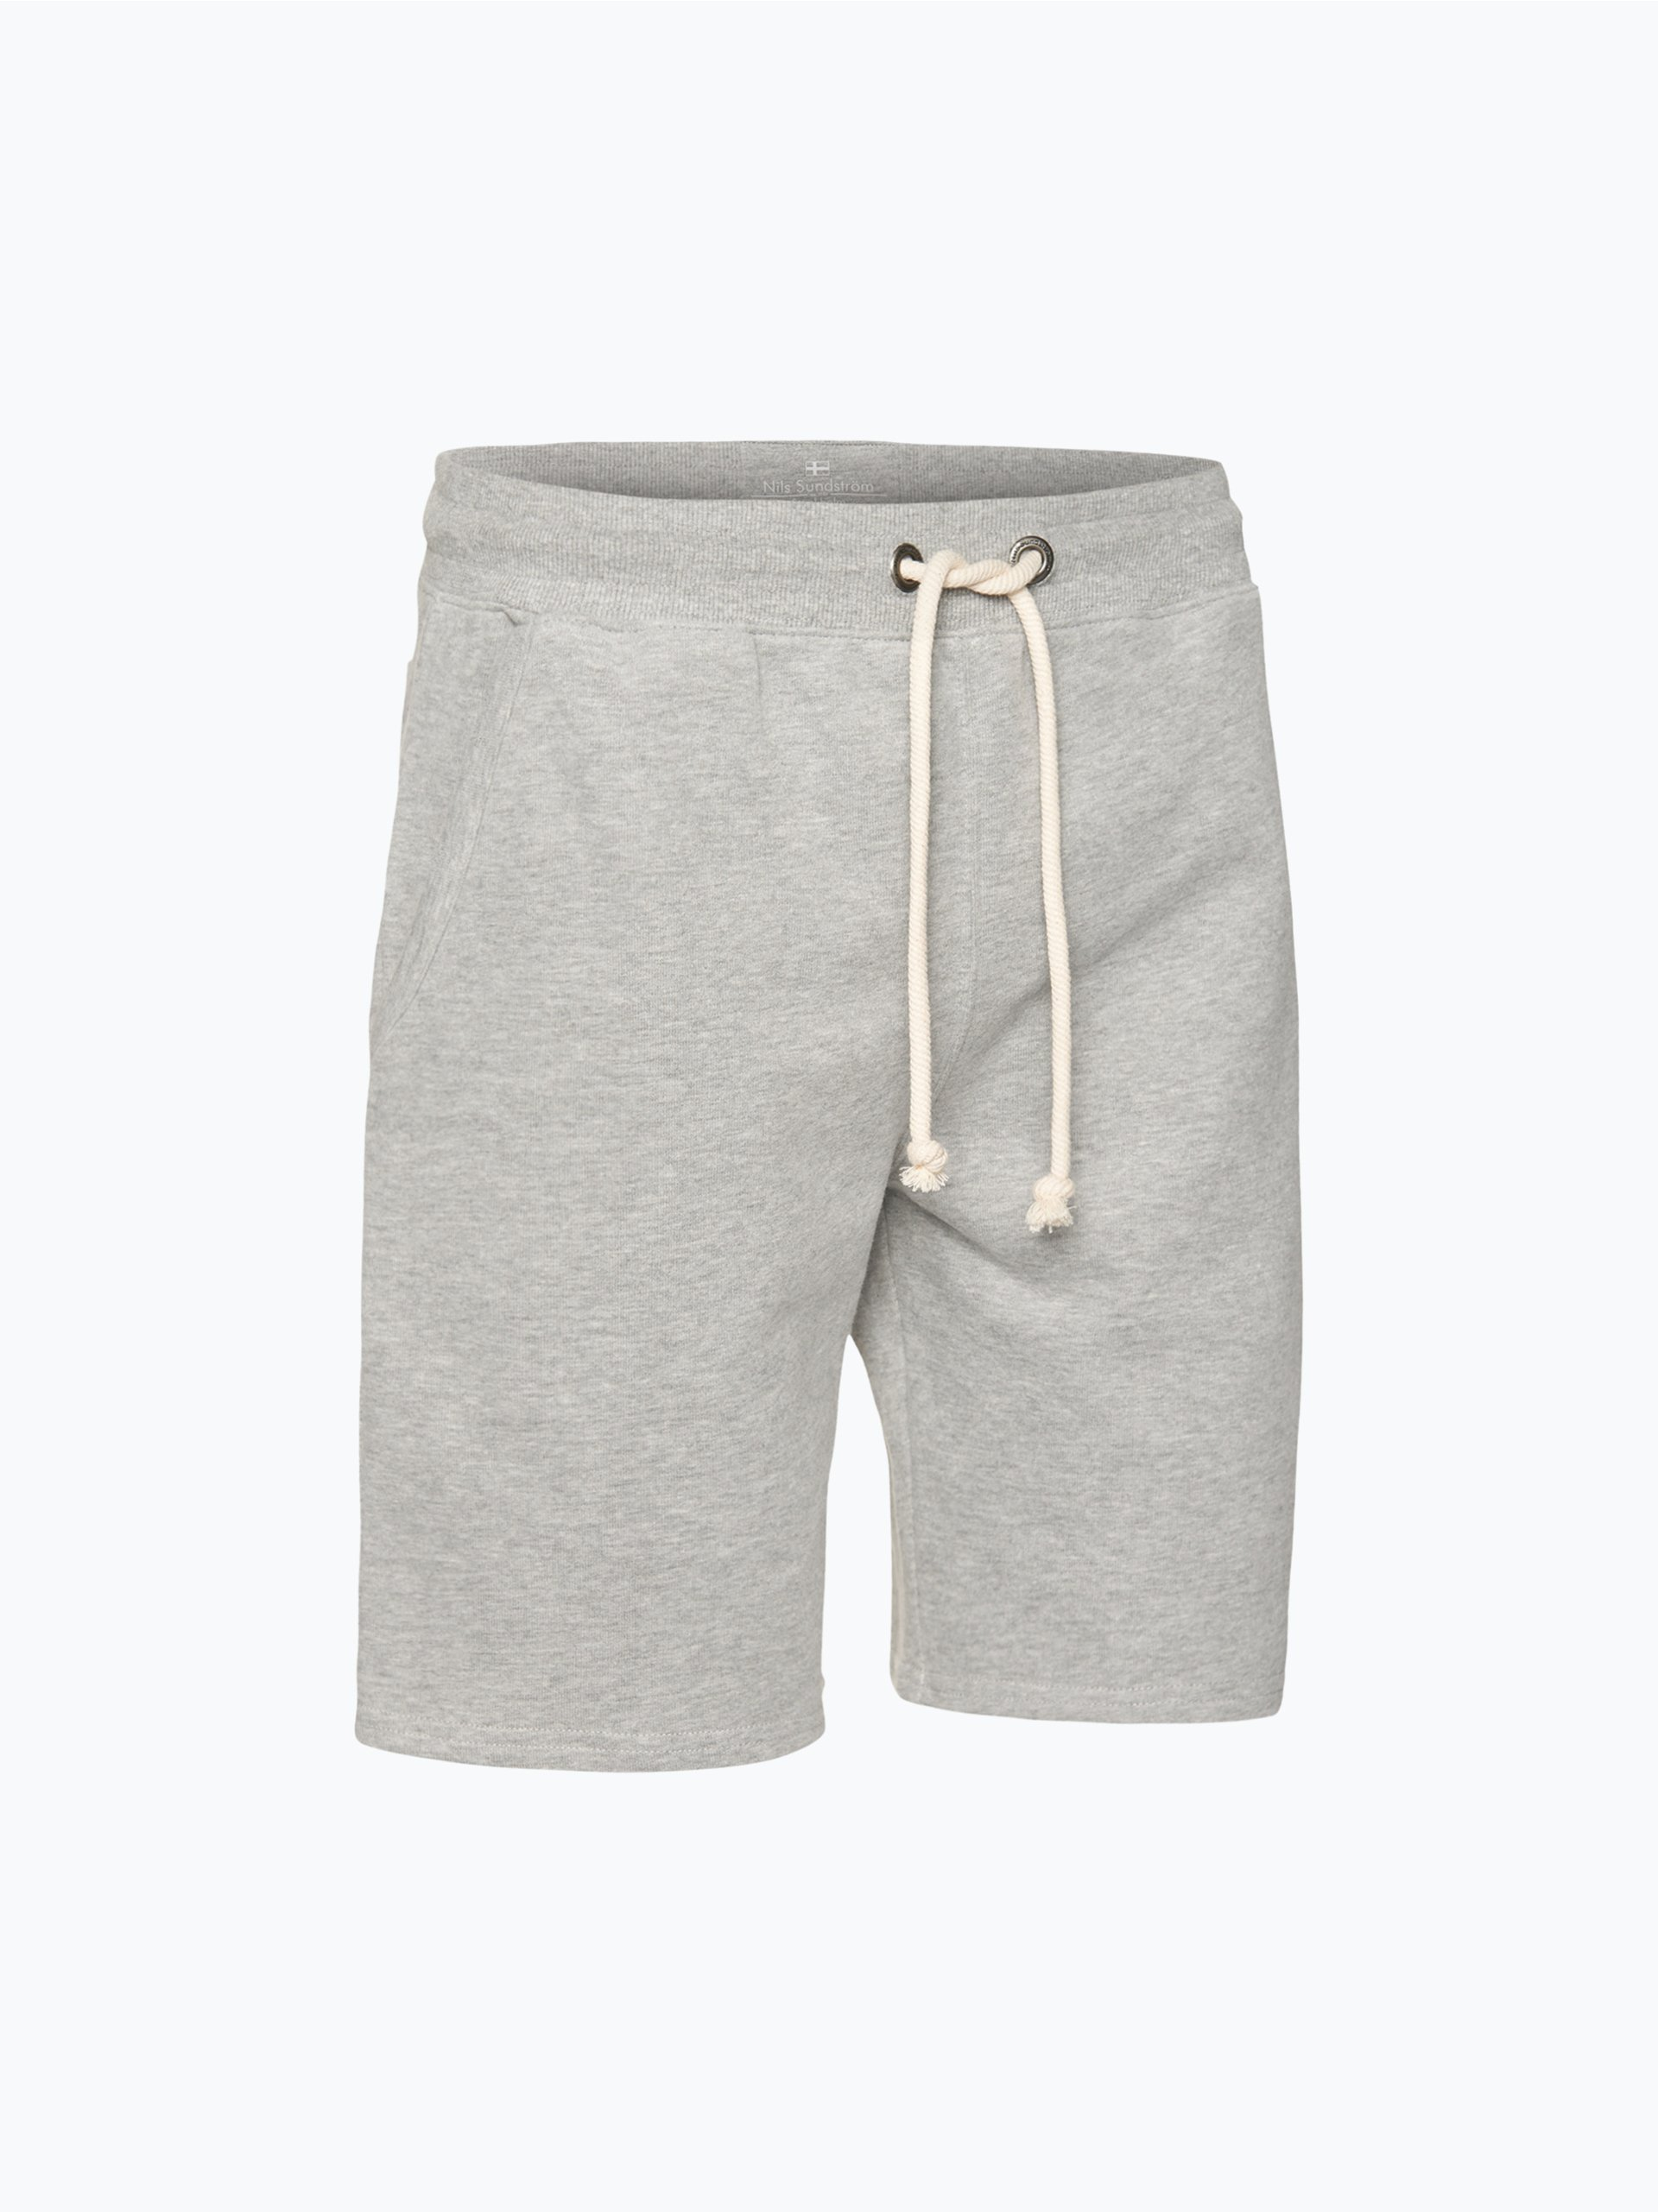 Nils Sundström Herren Shorts